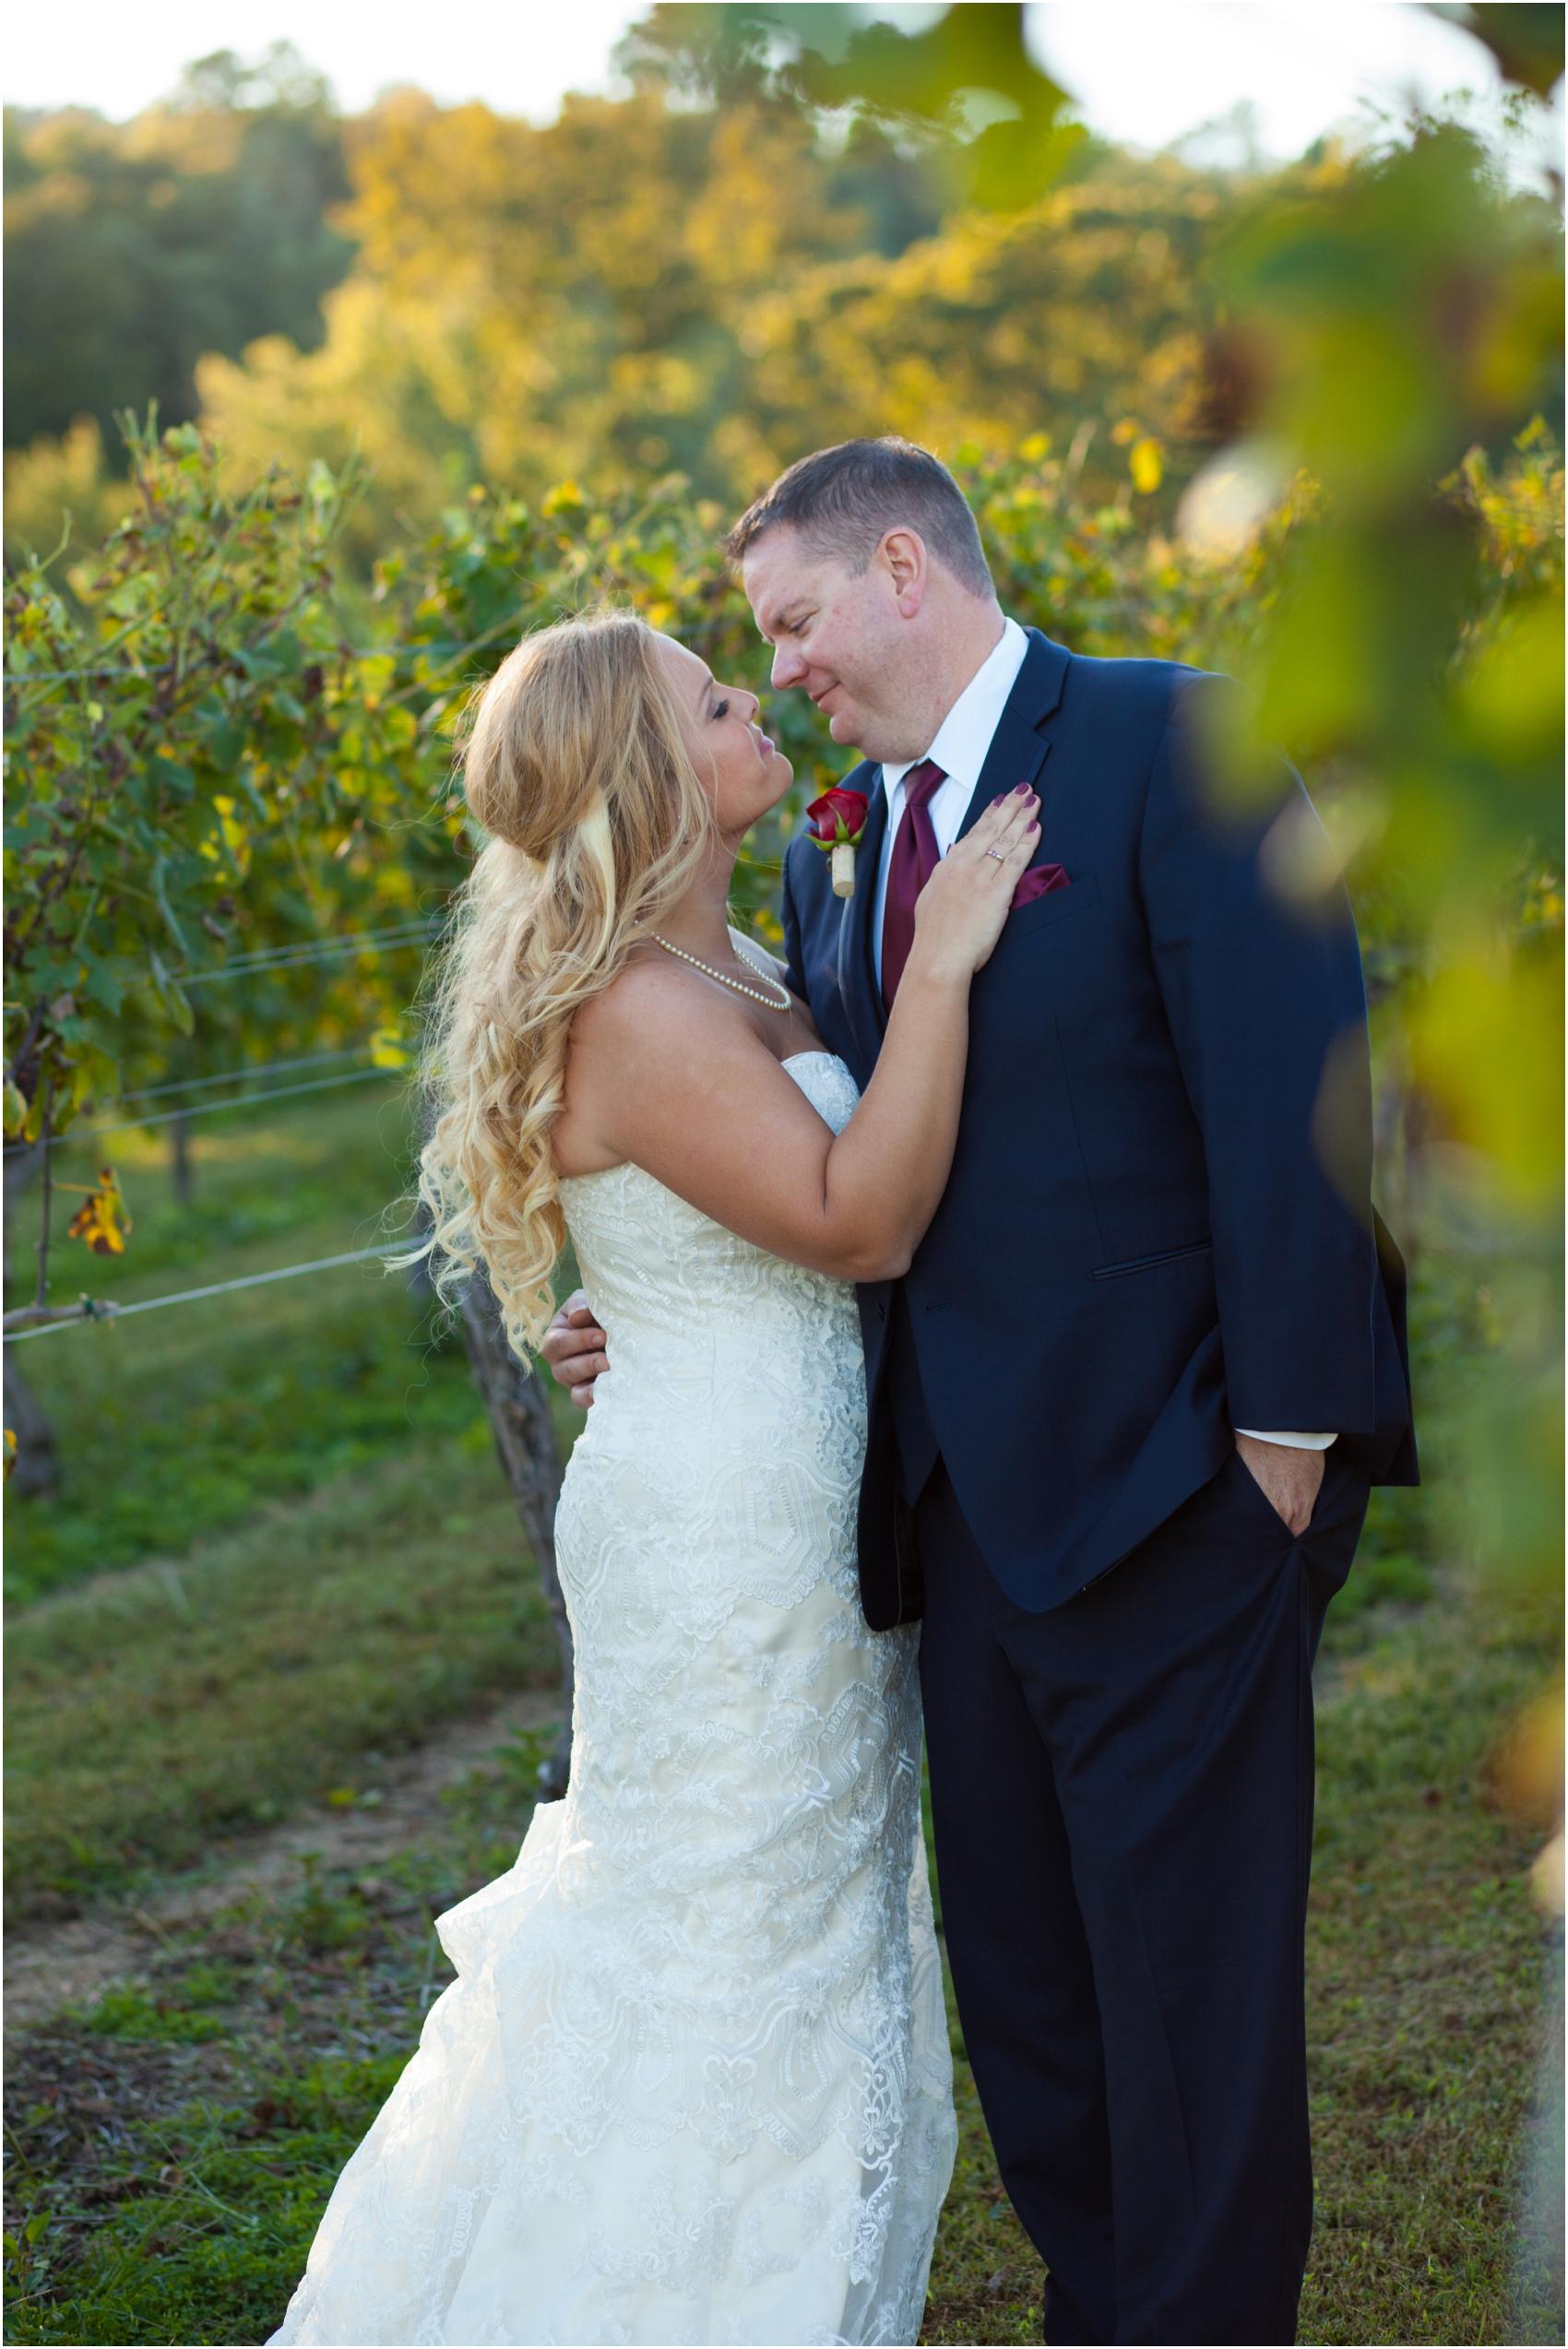 Grace-Estate-Winery-Fall-Virginia-Wedding-6907.jpg